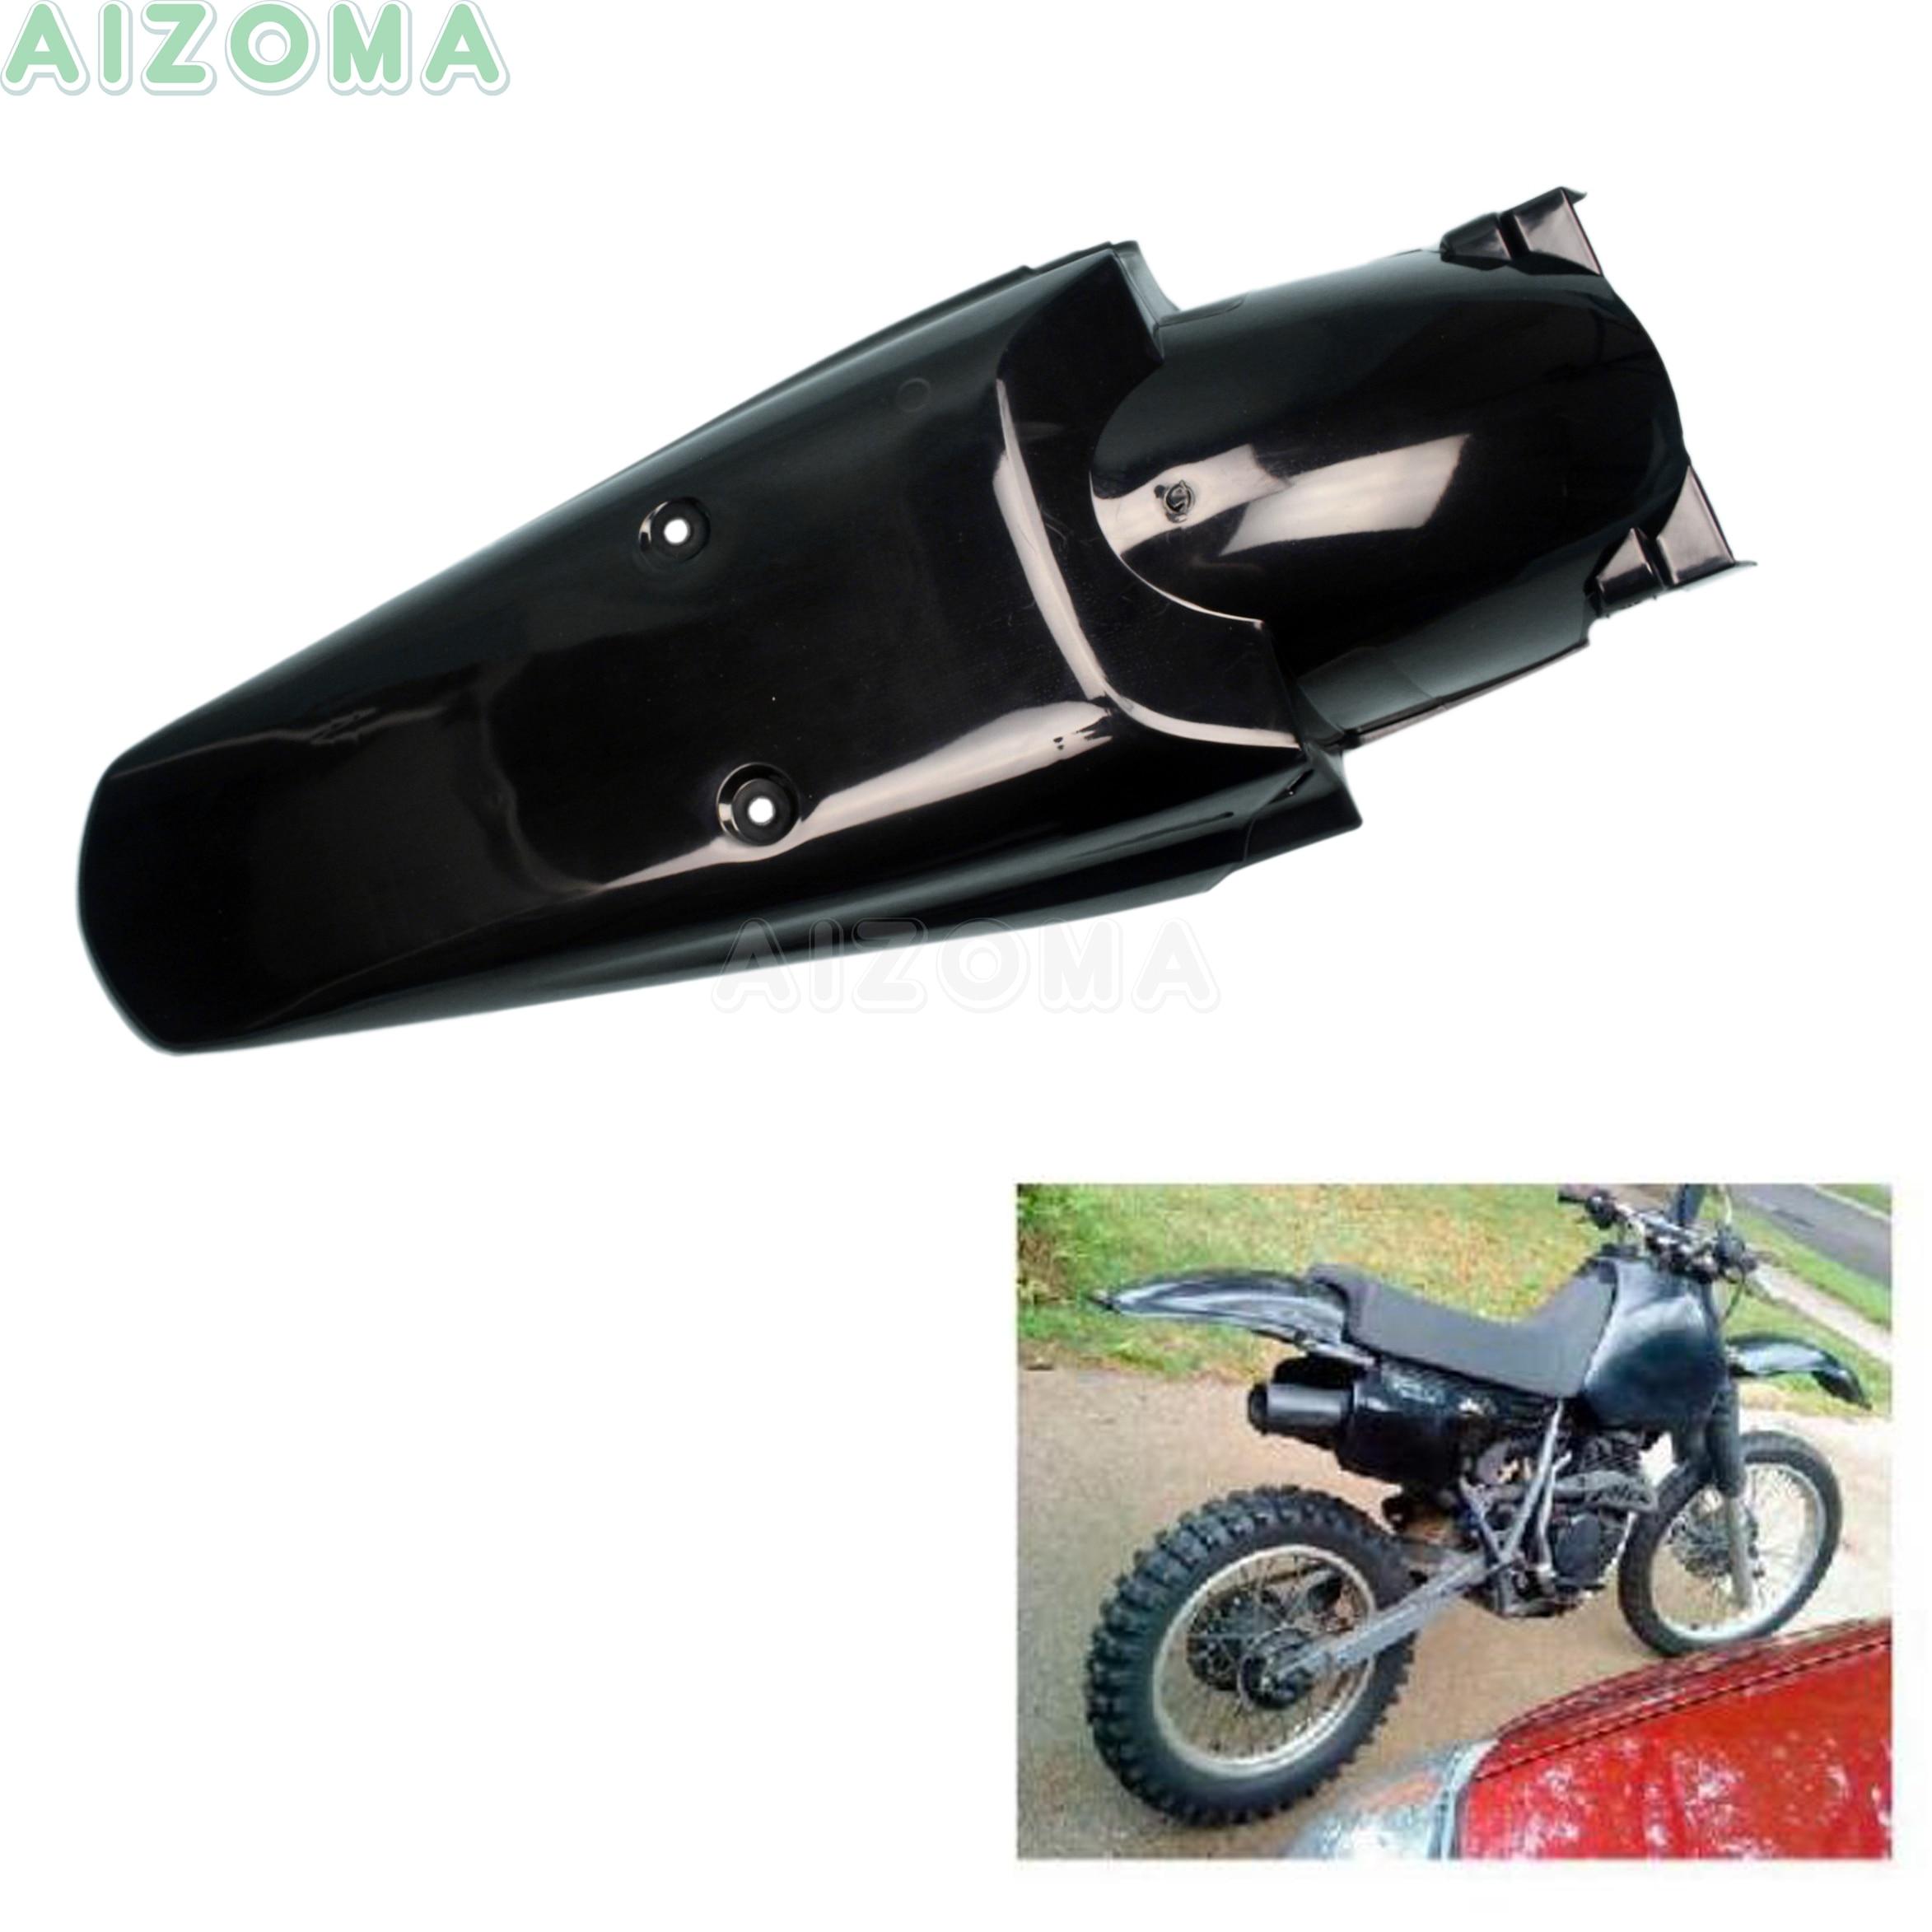 Offroad Rear Fenders Universal For Honda Yamaha Kawasaki Suzuki KTM Supermoto Mud Plate Fender Motocross Mudguard Prevent Dirty